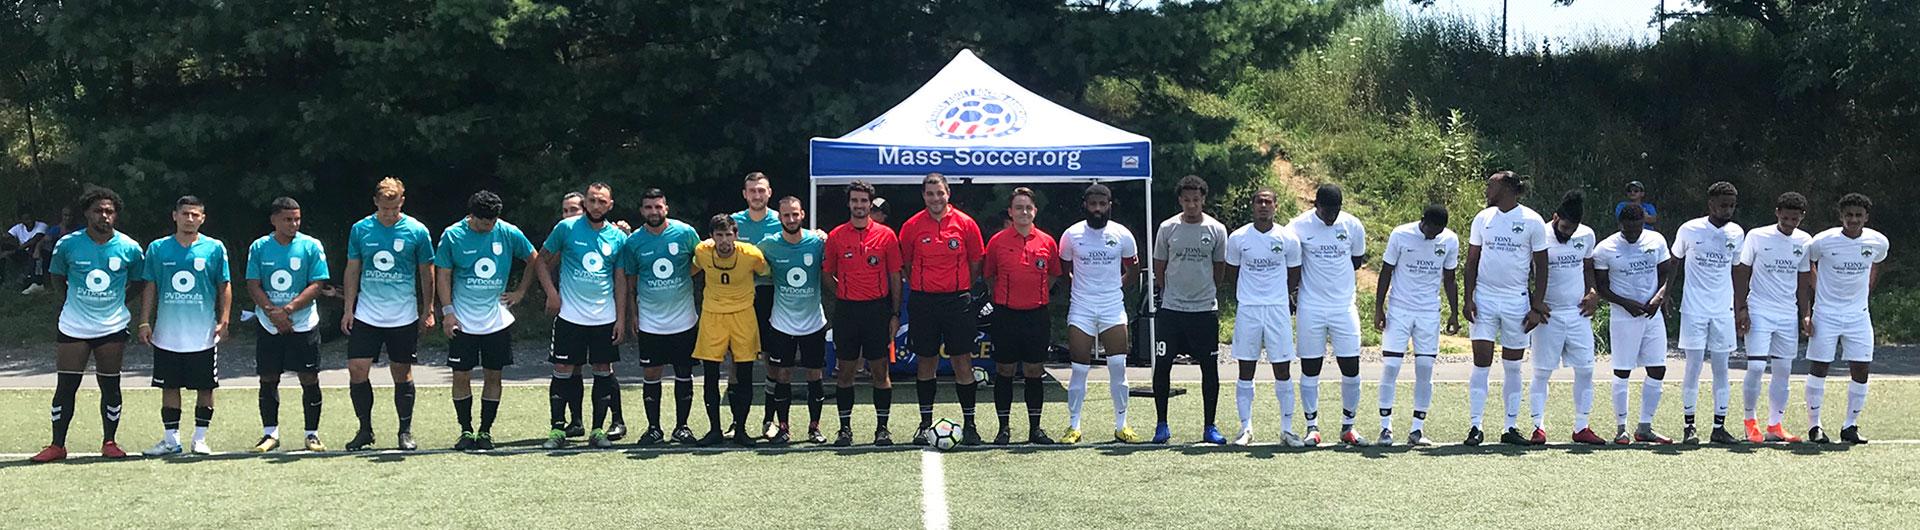 United States Soccer Referee Team